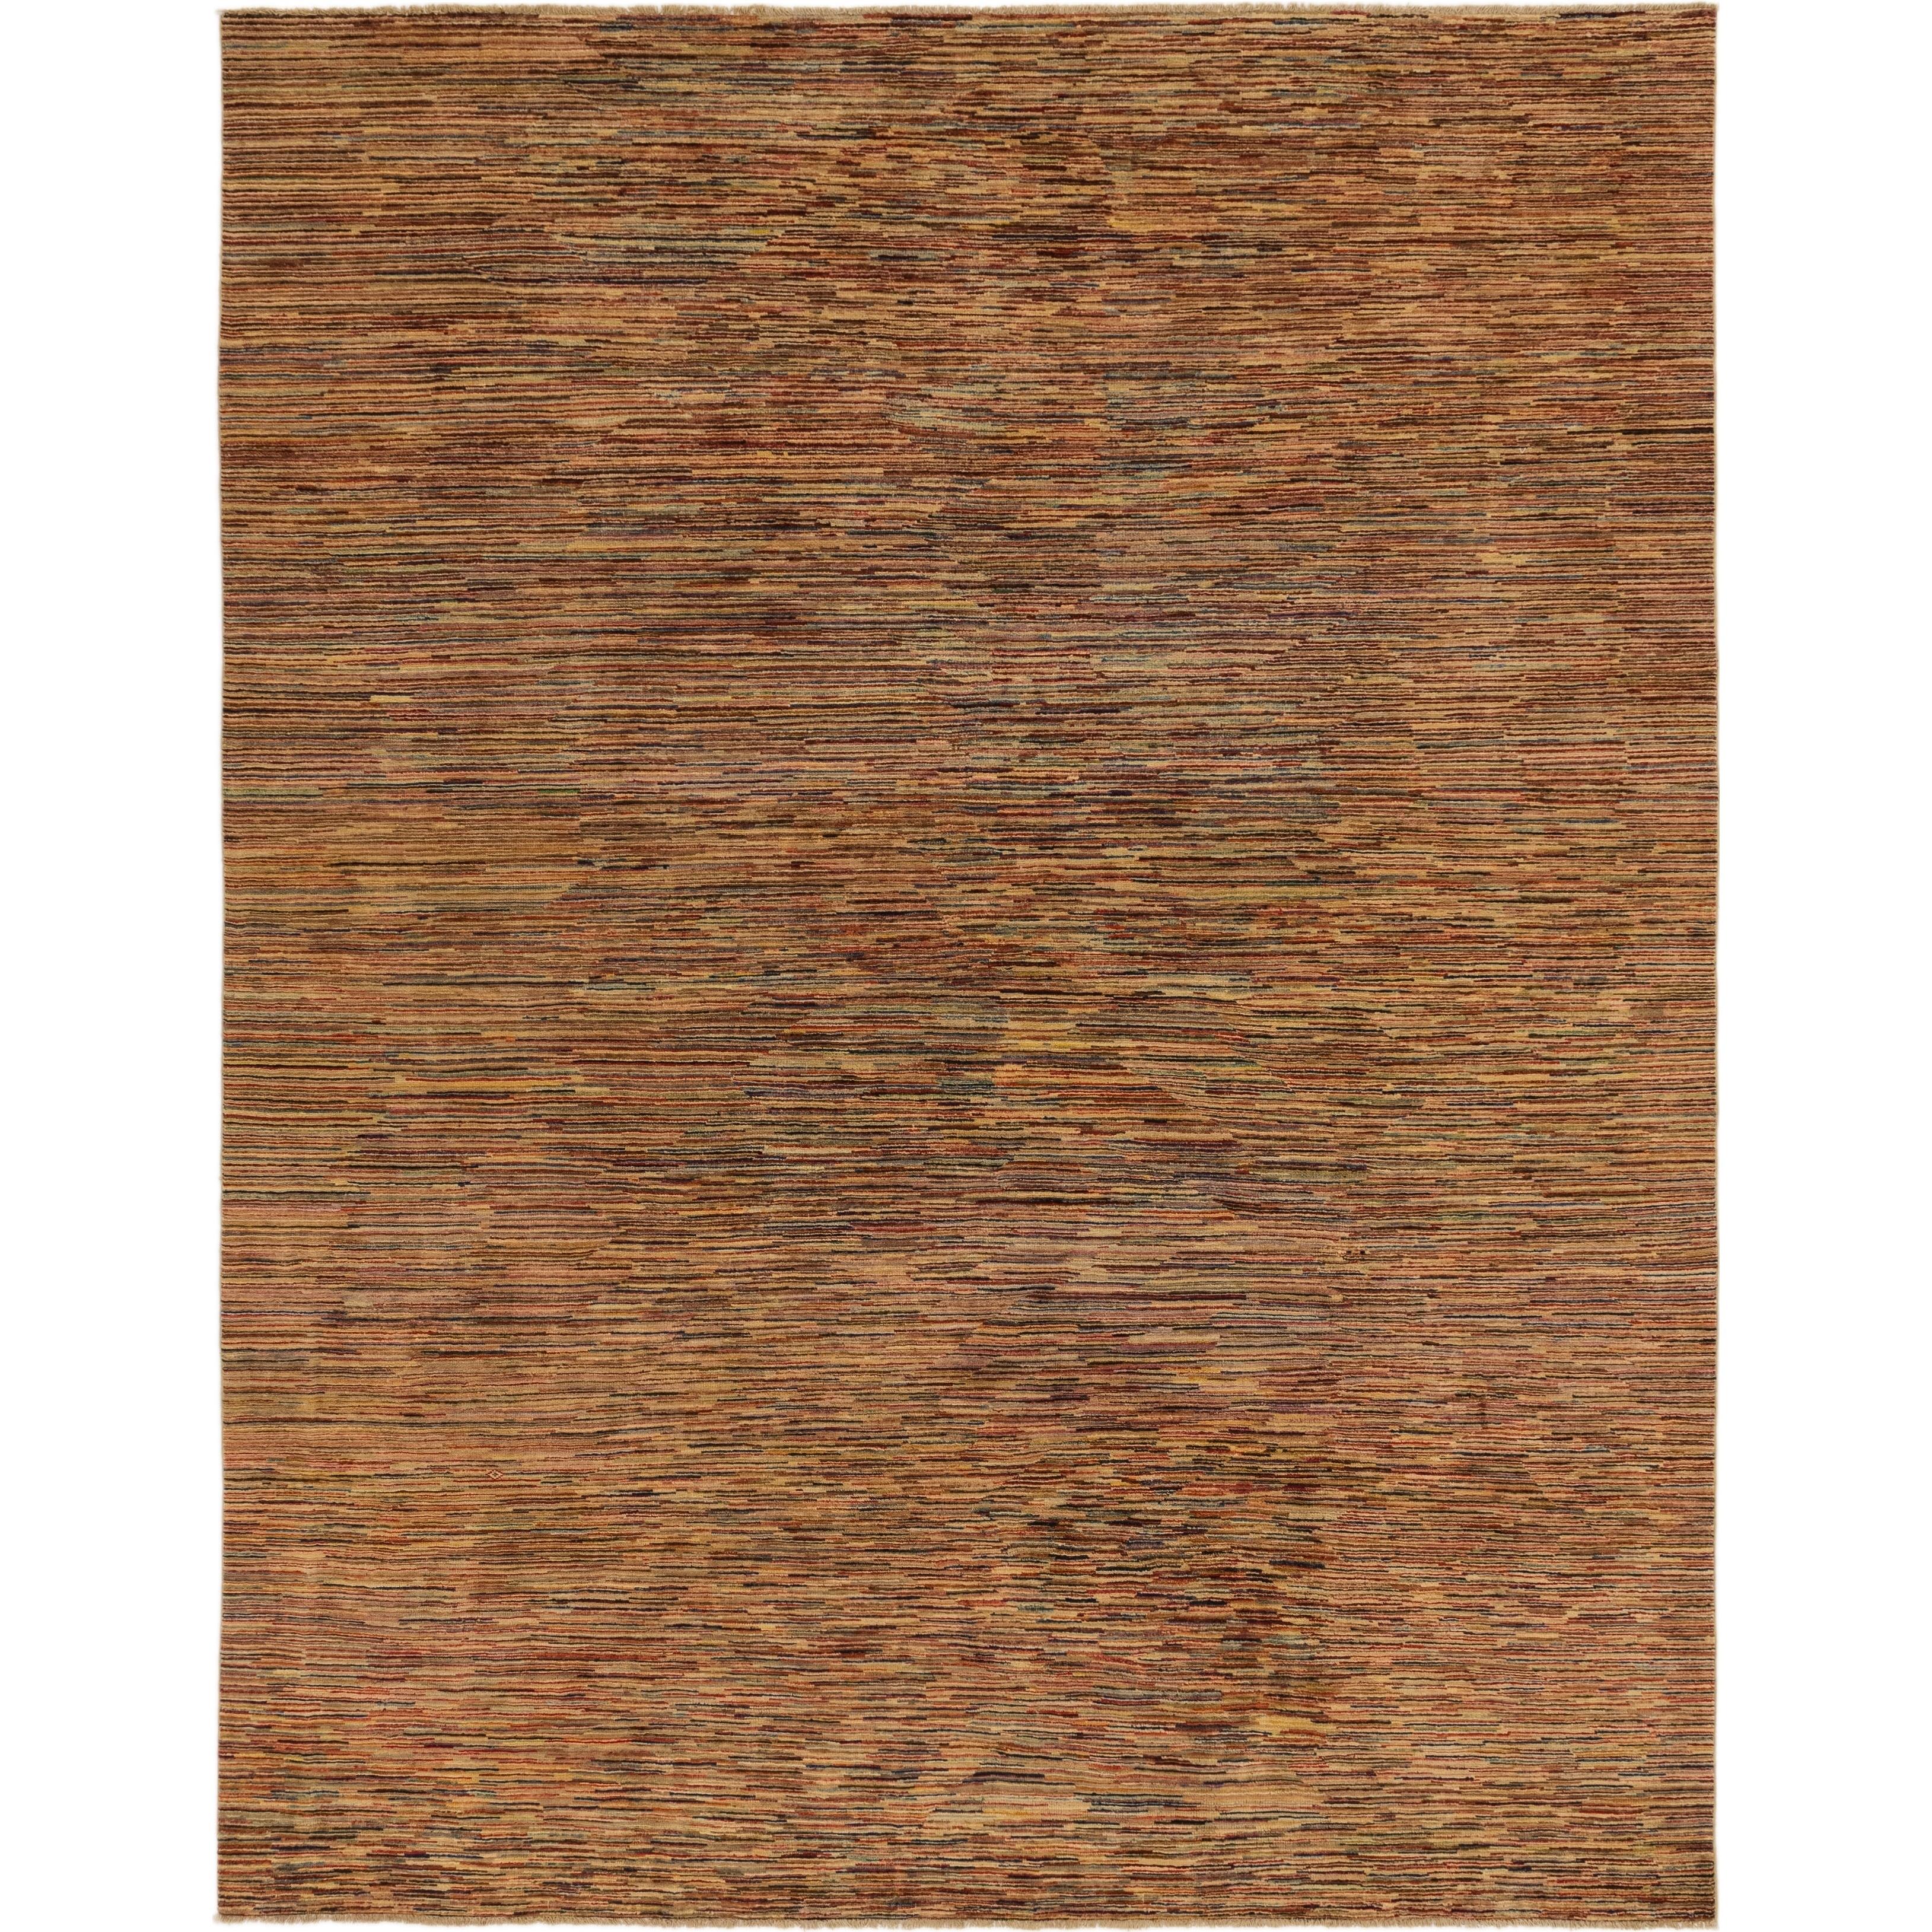 Hand Knotted Kashkuli Gabbeh Wool Area Rug - 9 6 x 12 8 (Multi - 9 6 x 12 8)